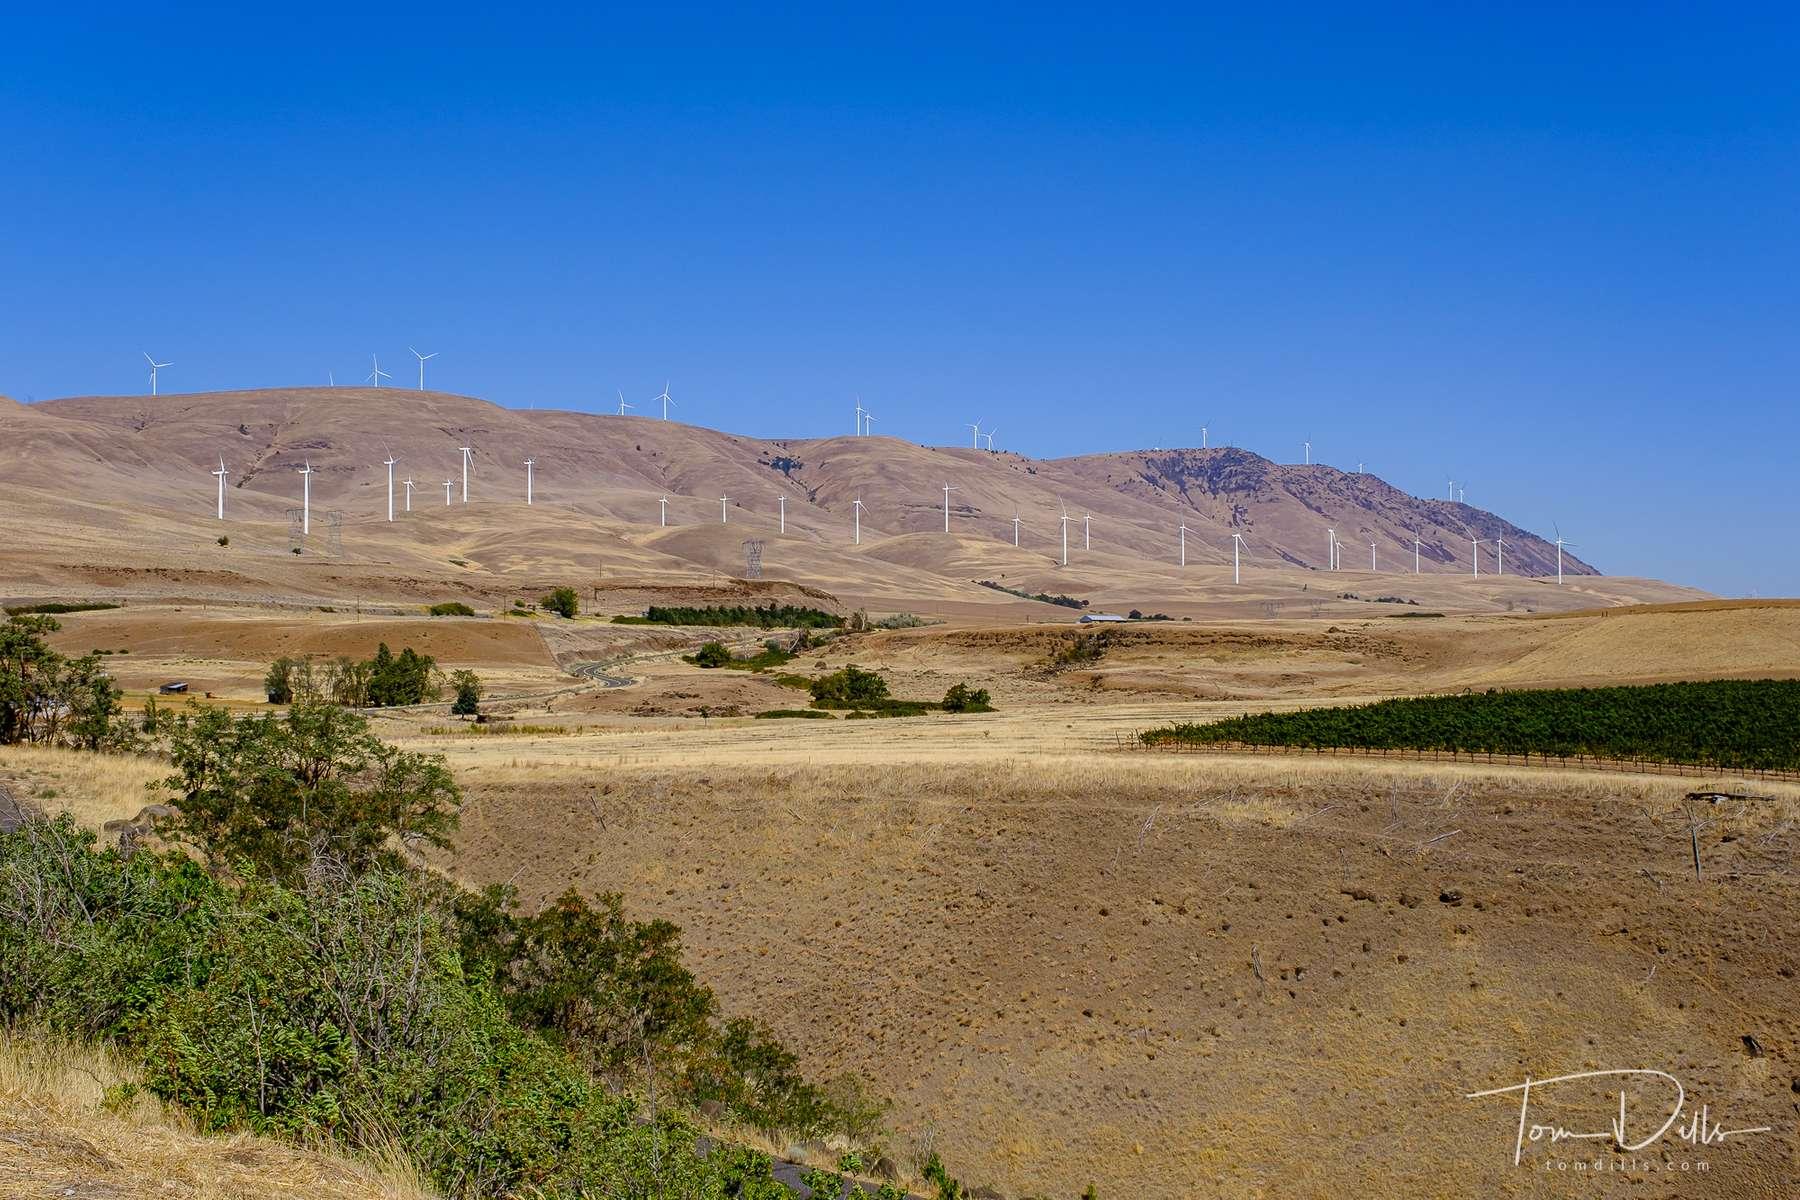 Wind turbines in the Columbia River Valley from Stonehenge along SR-14 near Maryhill, Washington